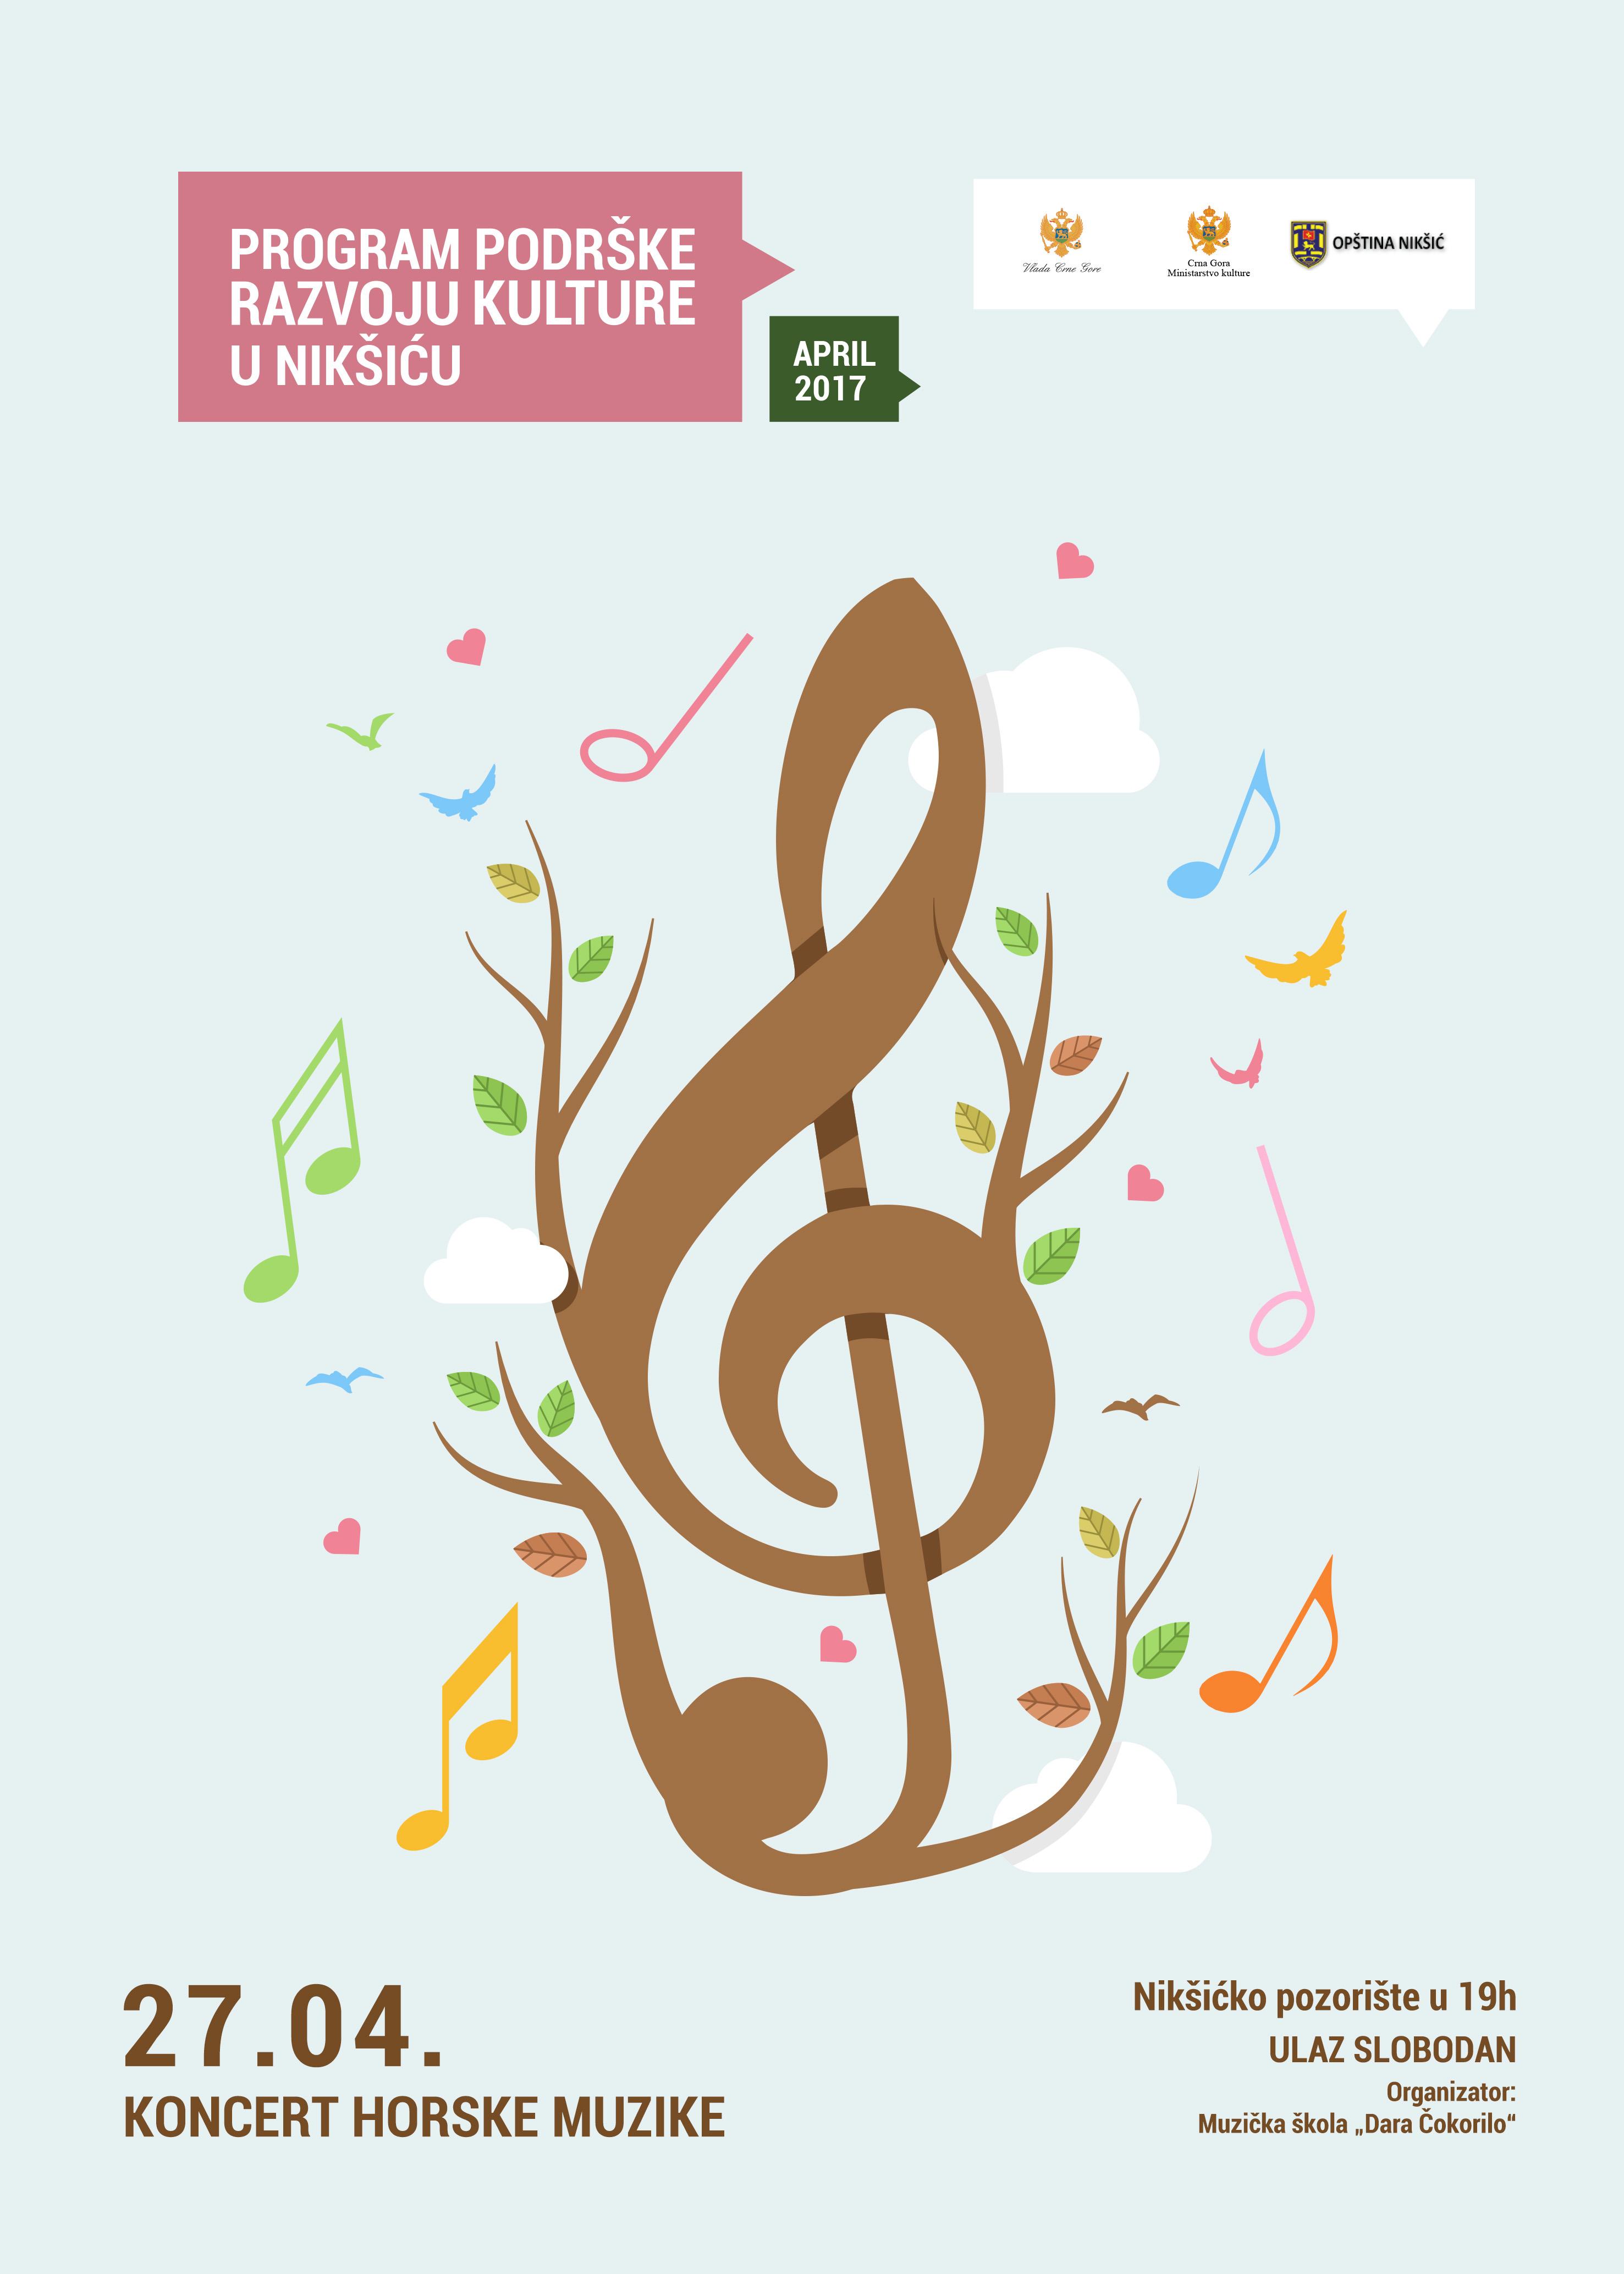 Koncert horske muzike u Pozorištu